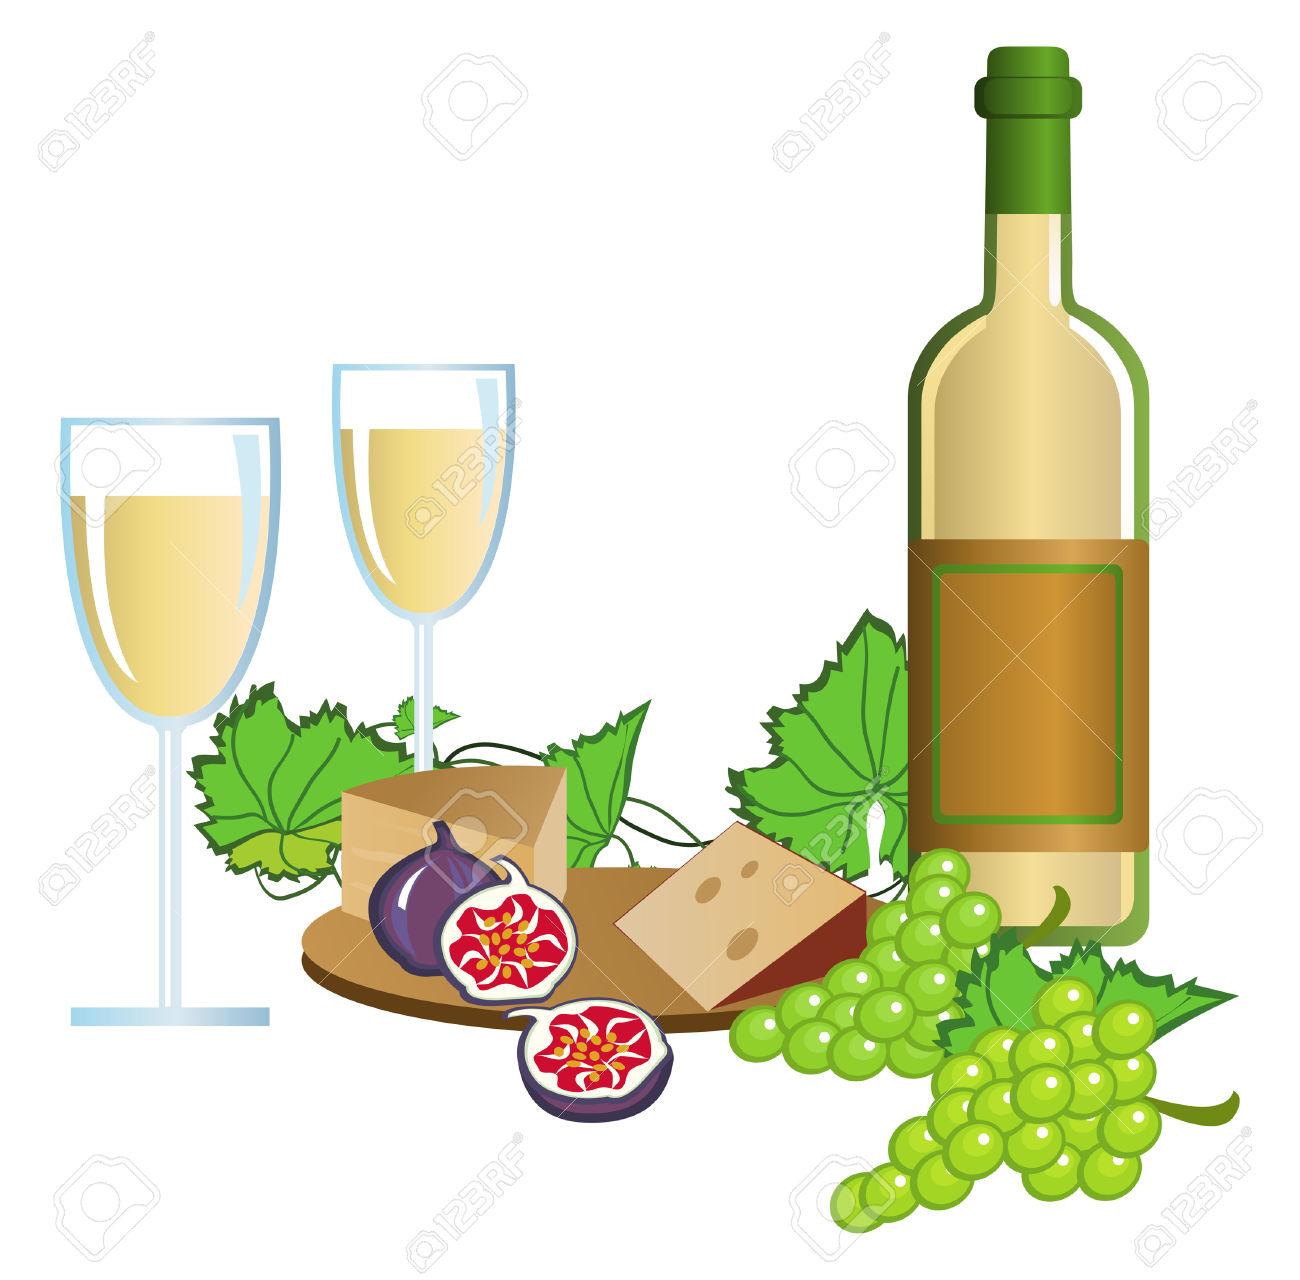 Wine Tasting Clipart Free Clip Art Image-Wine Tasting Clipart Free Clip Art Images-19